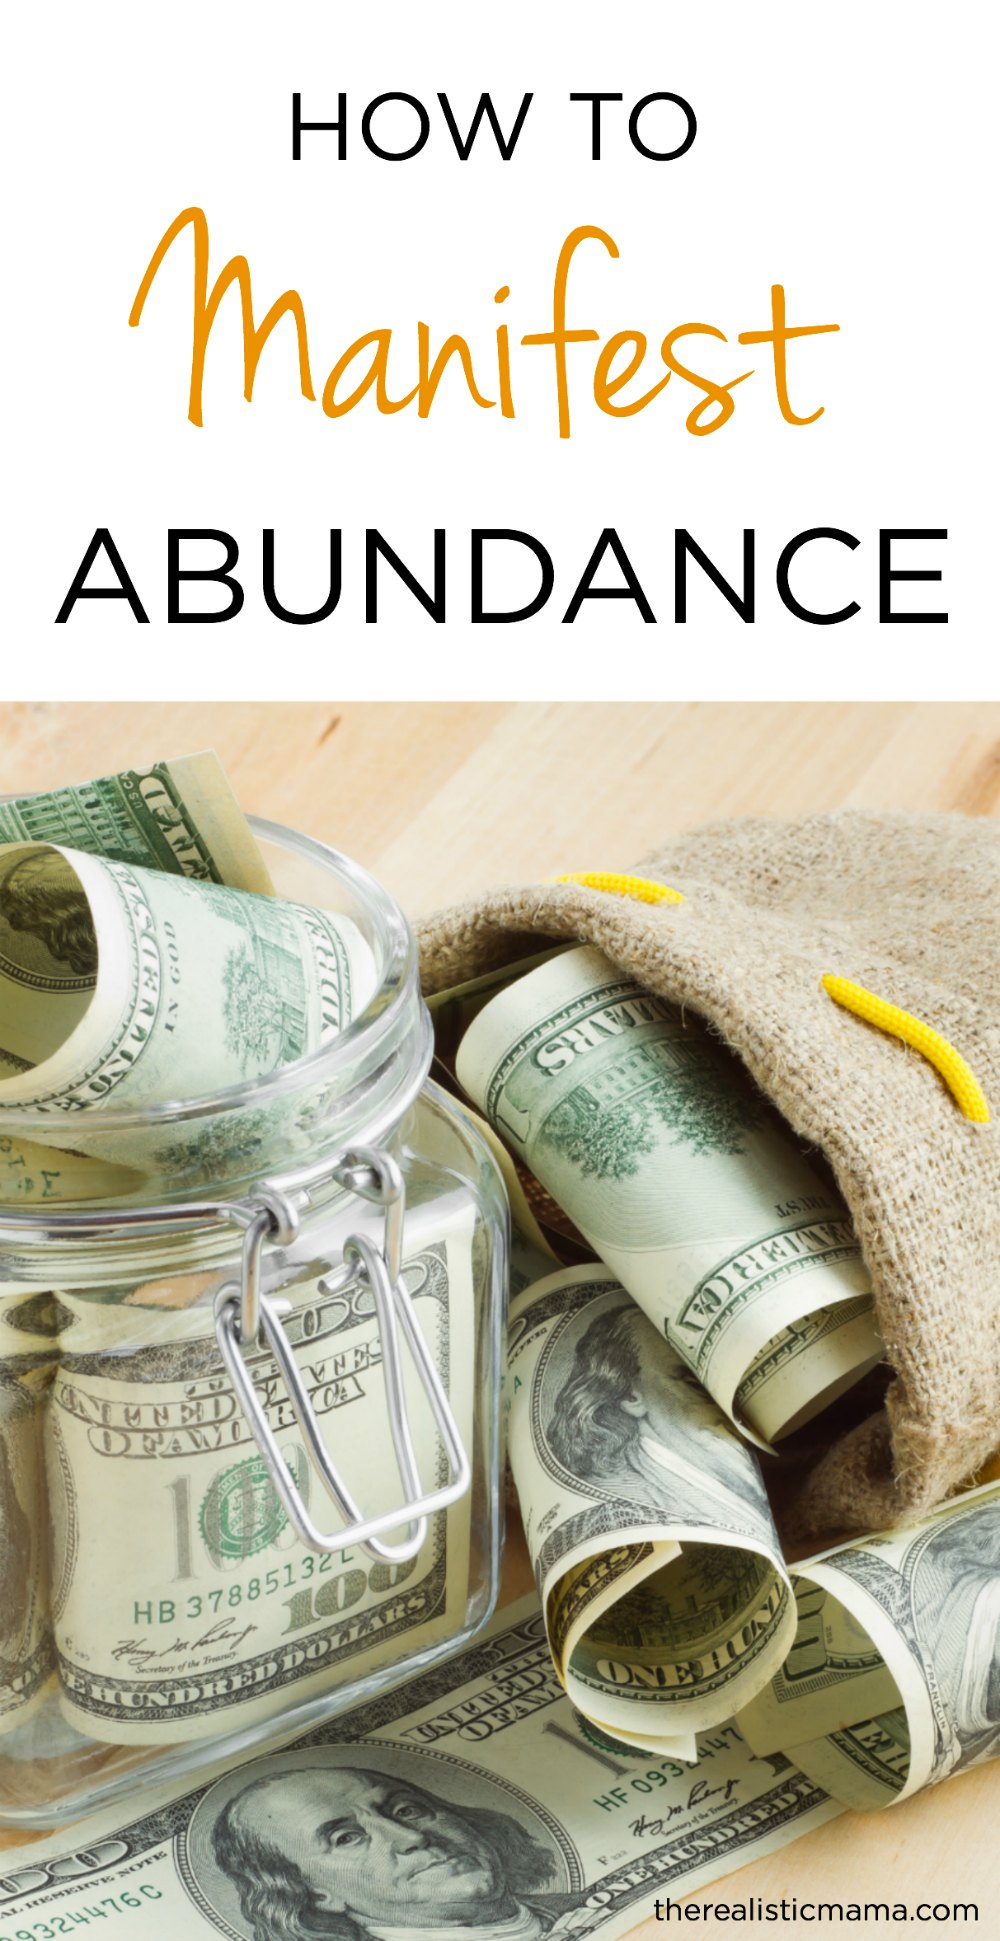 How to Manifest Abundance